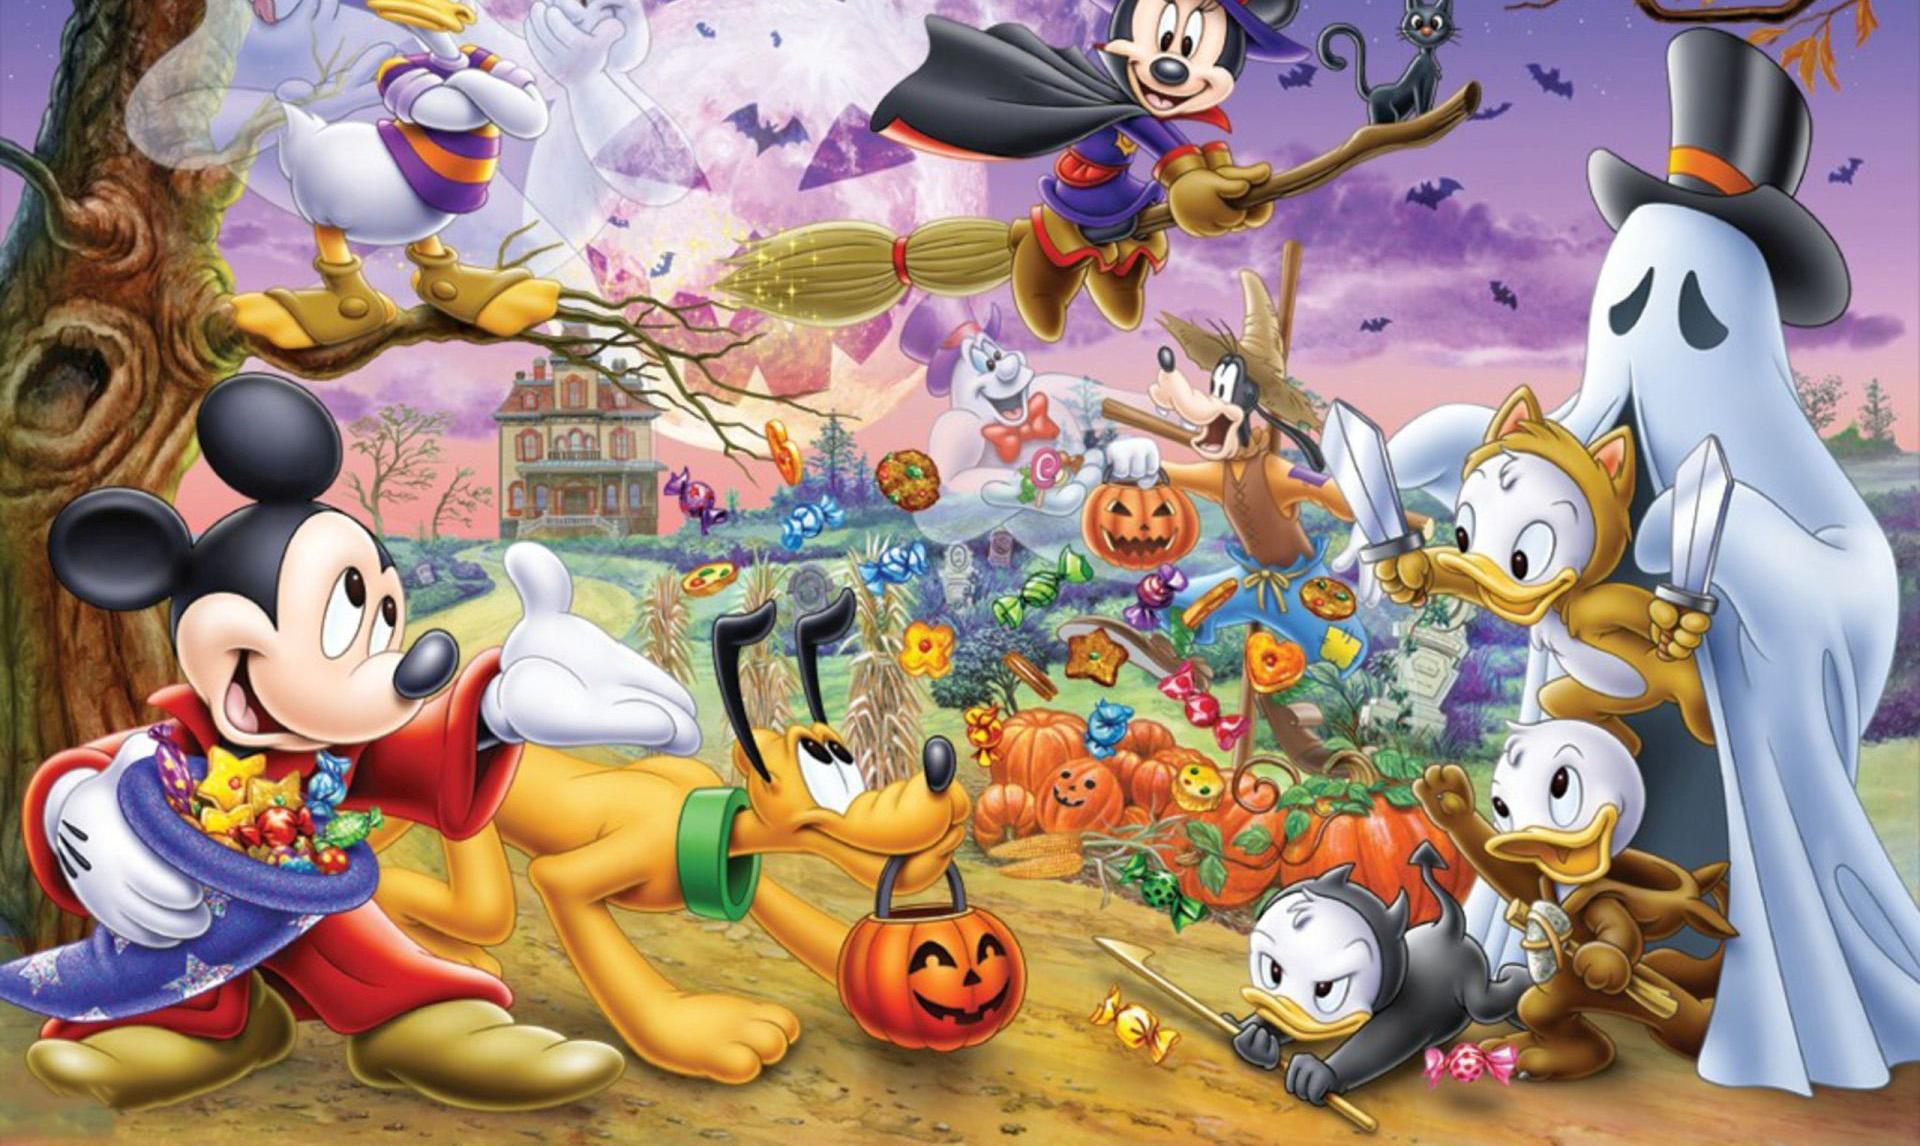 Anime Graffiti Wallpaper Disney Halloween Backgrounds Free Pixelstalk Net